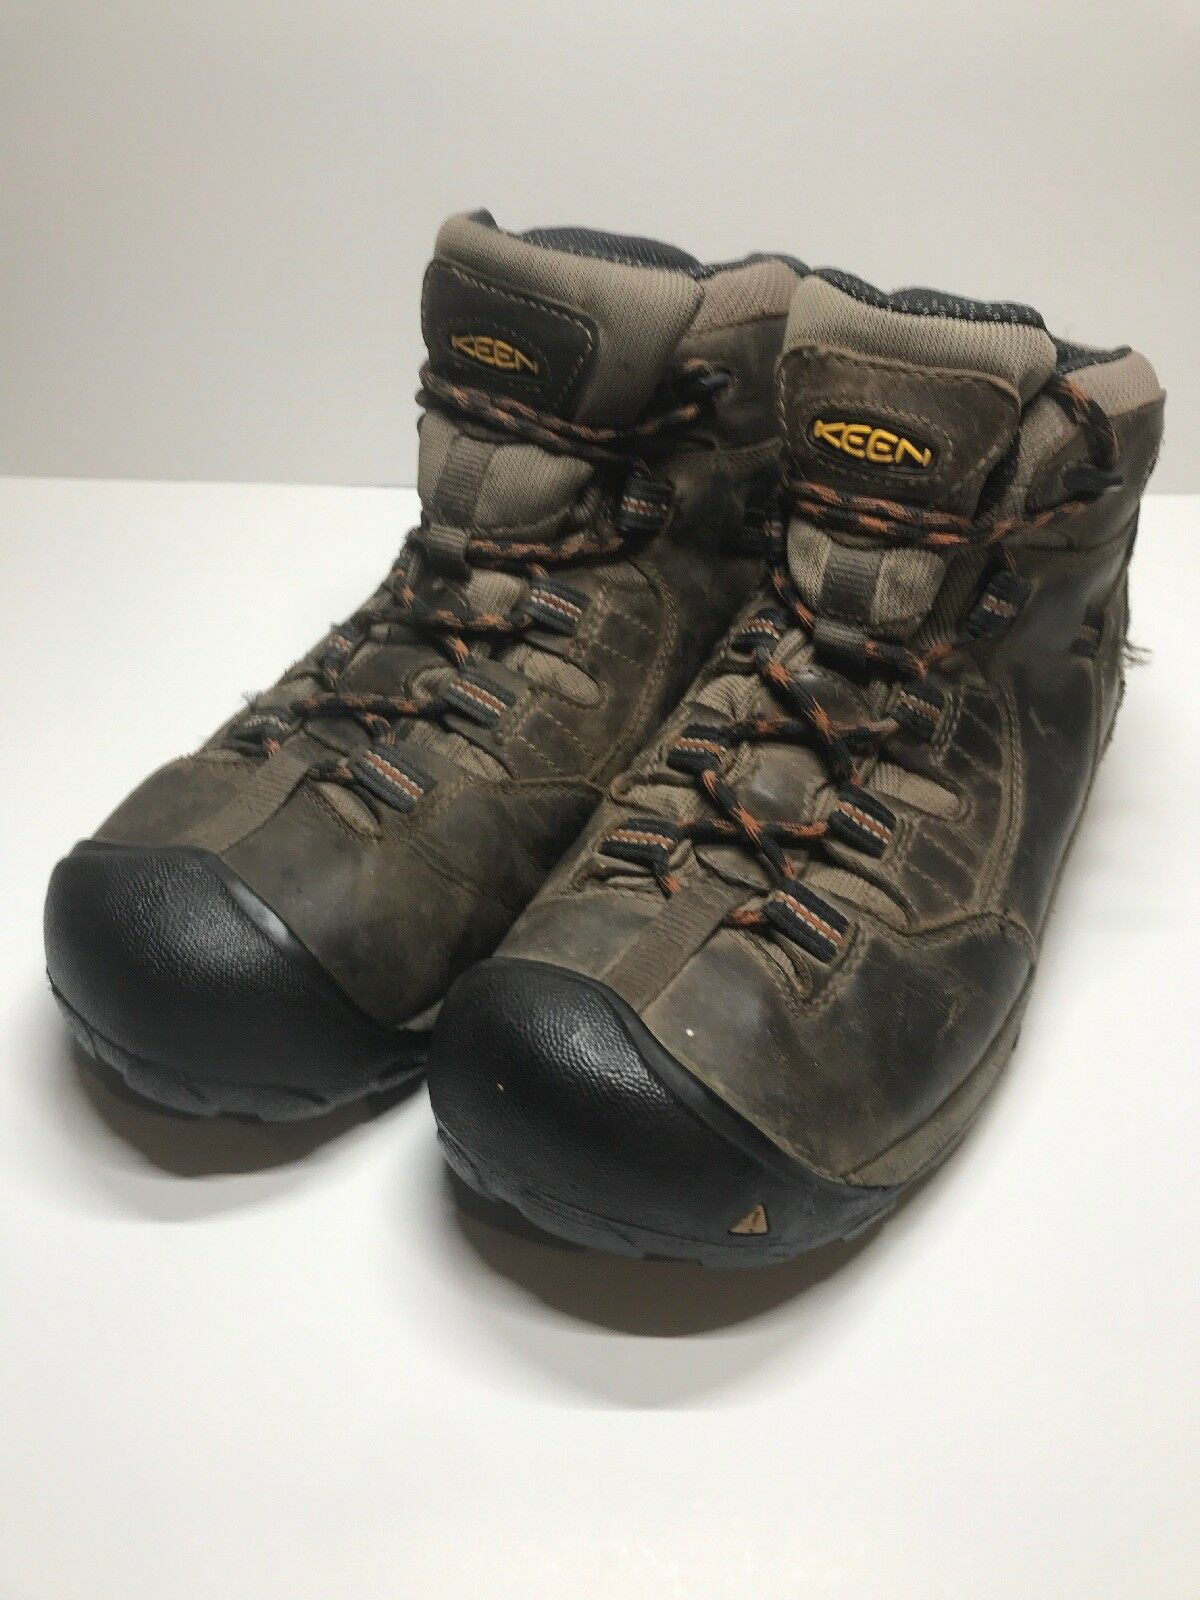 Mens KEEN braun Leather Waterproof Hiking Hiking Hiking Trail schuhe Größe 11   44.5 10d774